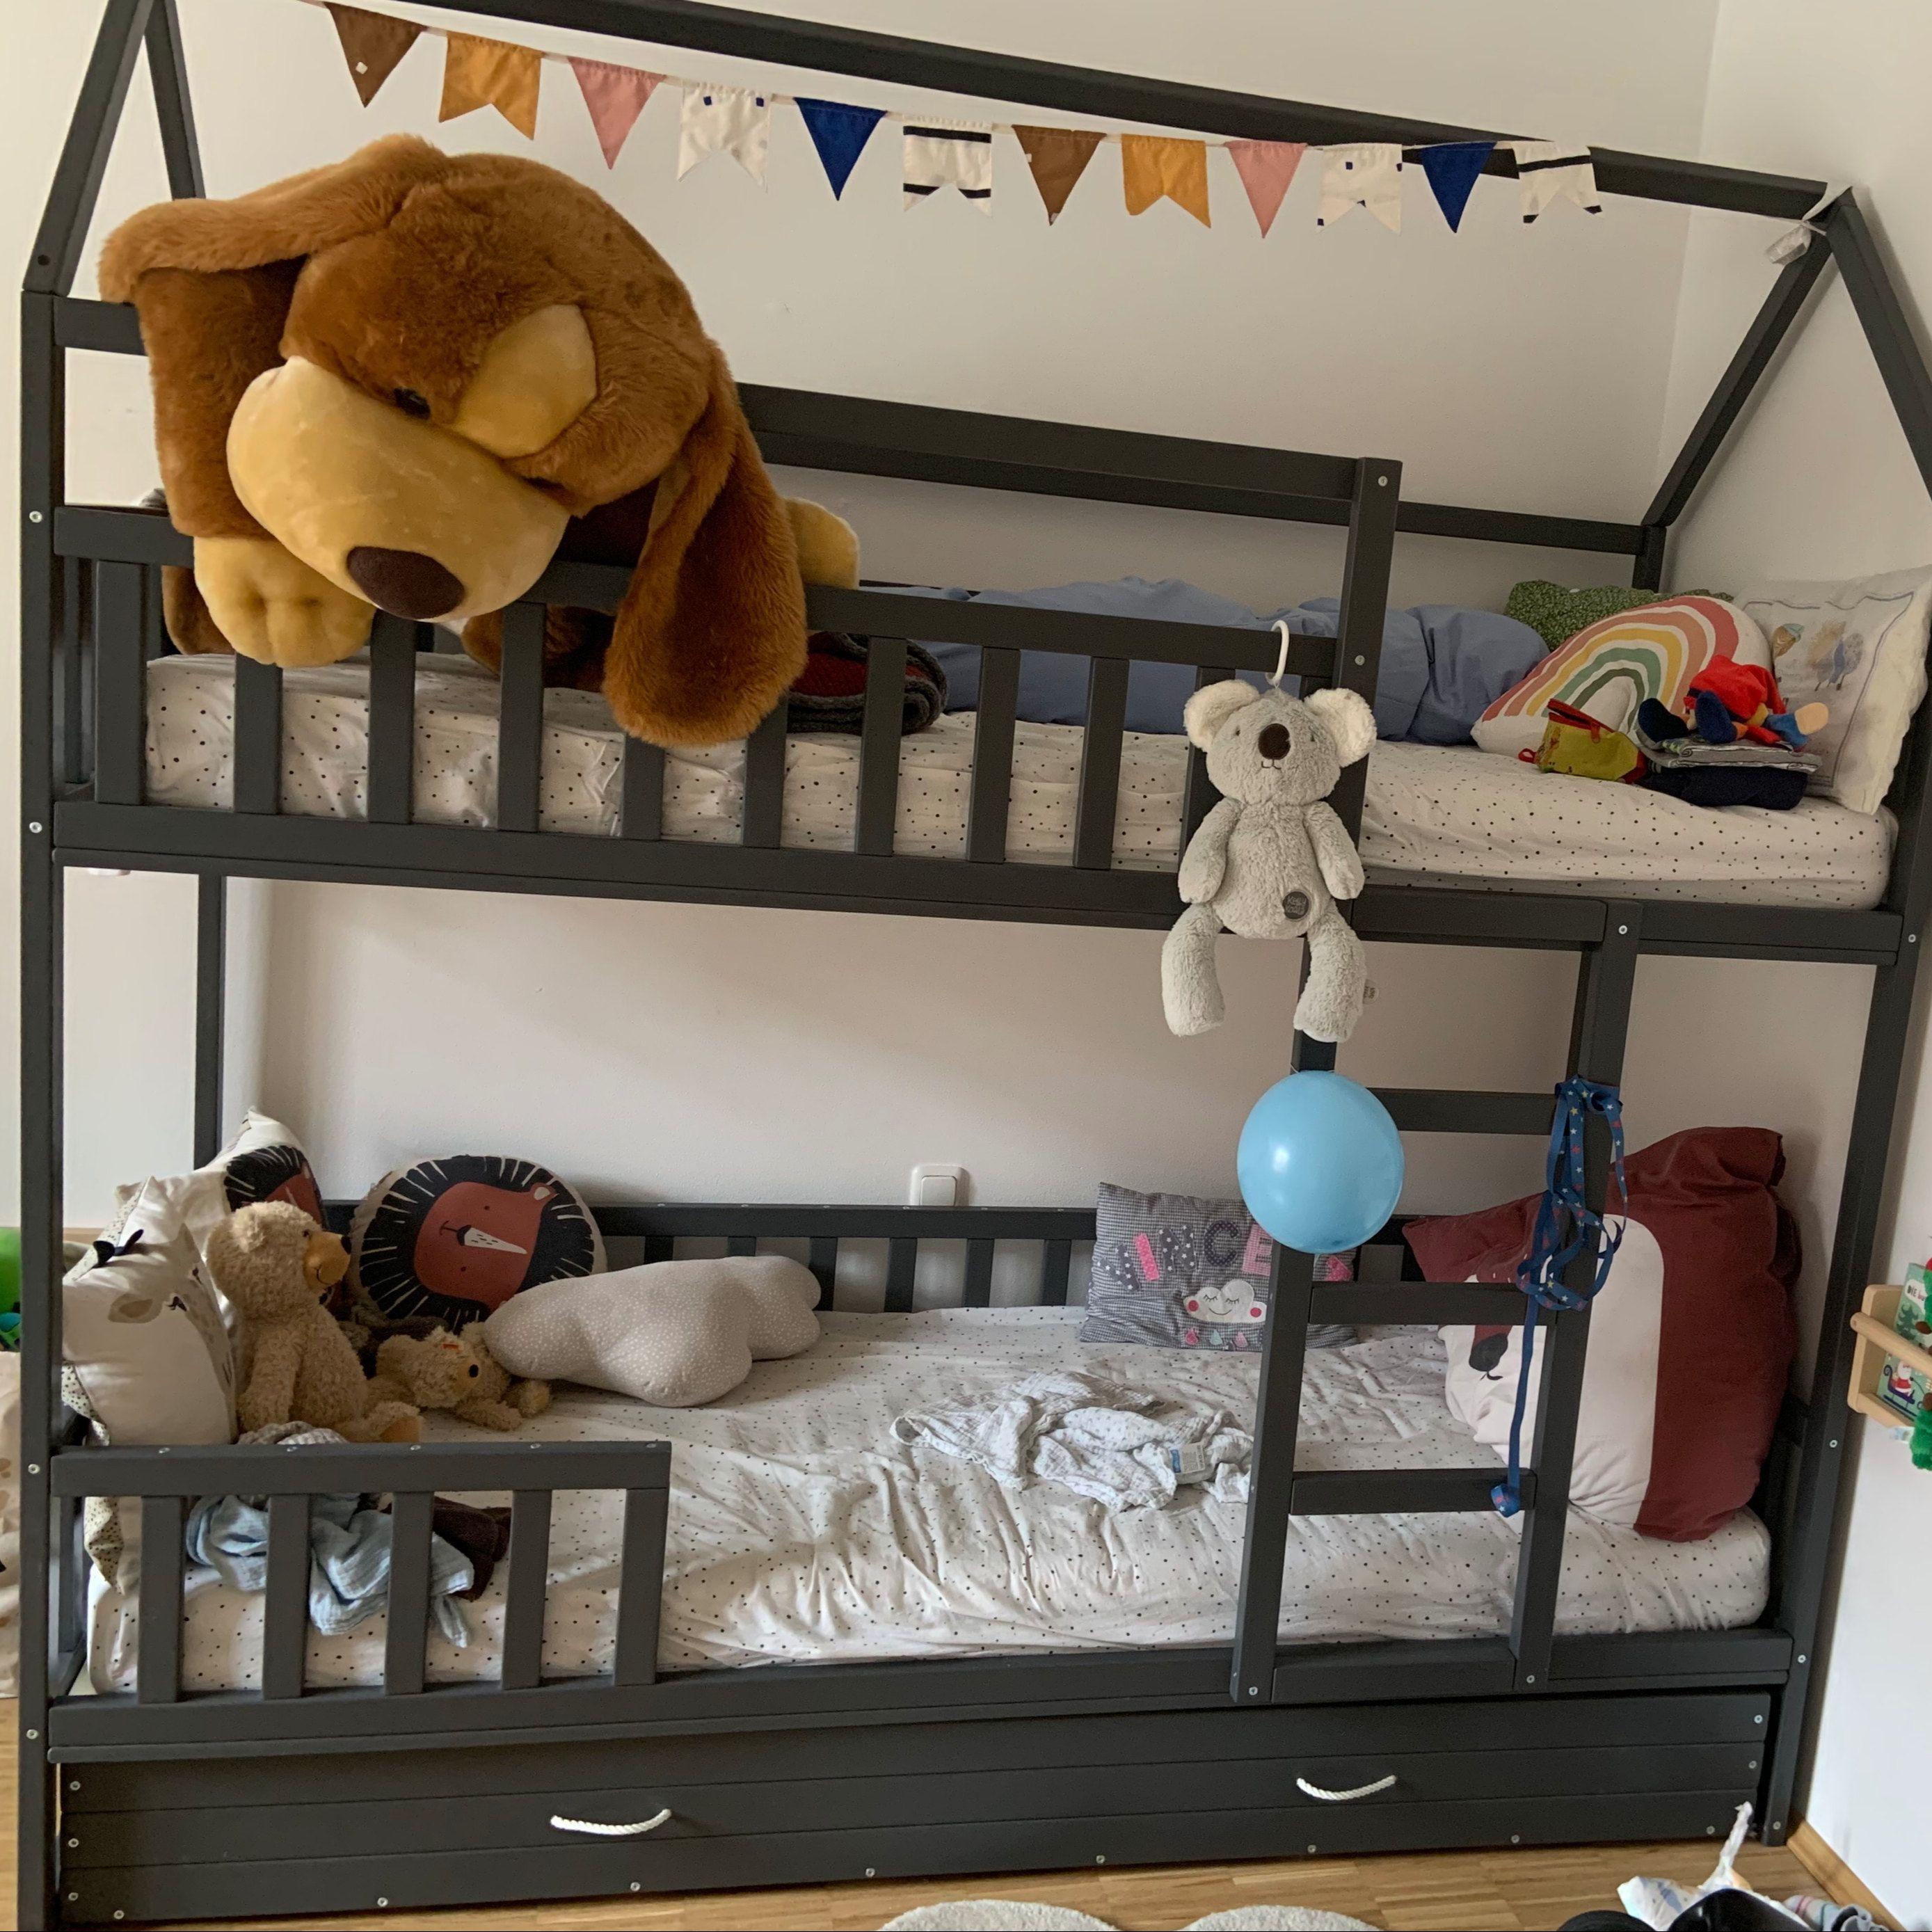 Toddler Bed Nursery Crib Children Bed Montessori Bed Kid Bed Wood Bed Children Home Waldorf Toy Kids Bedroom Floor Bed Kid Beds Toddler Bed Nursery Crib